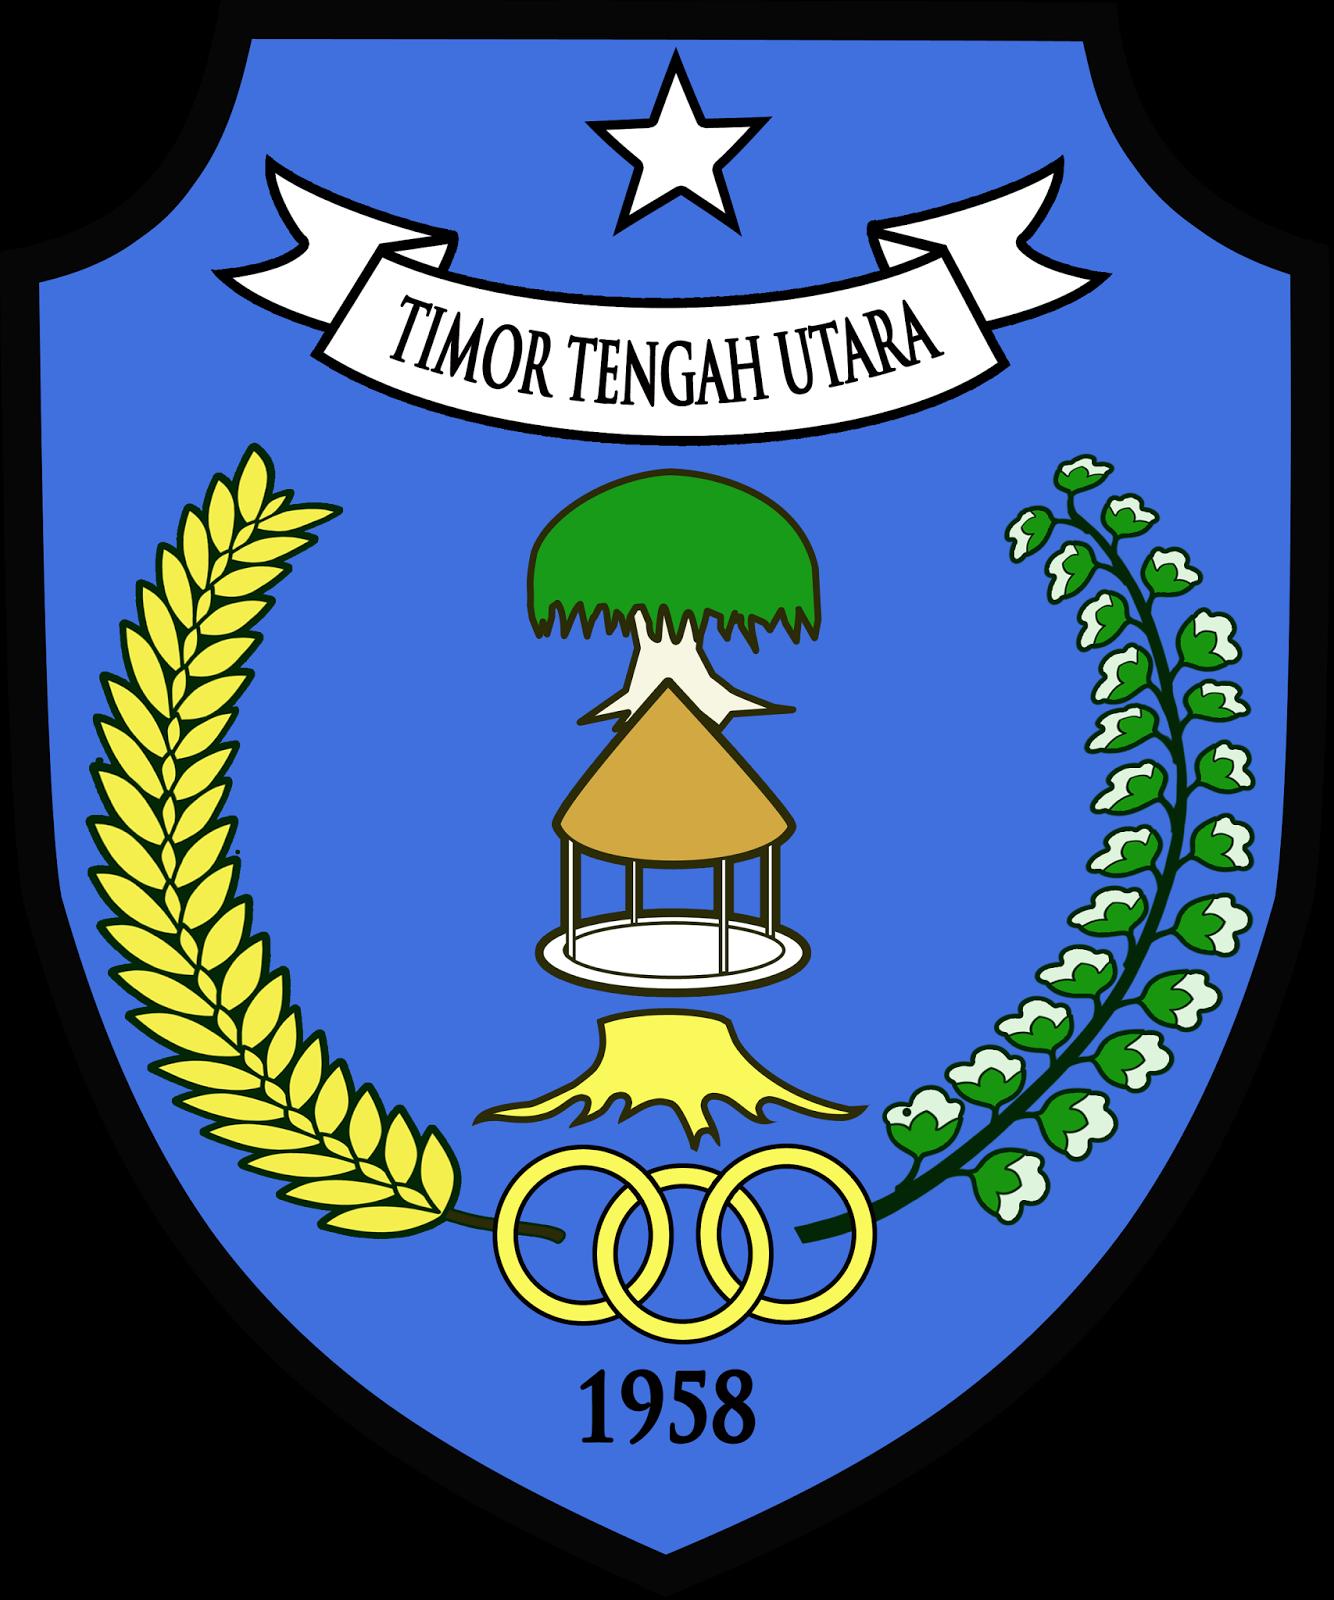 Timor Tengah Utara Brasao Bandeiras